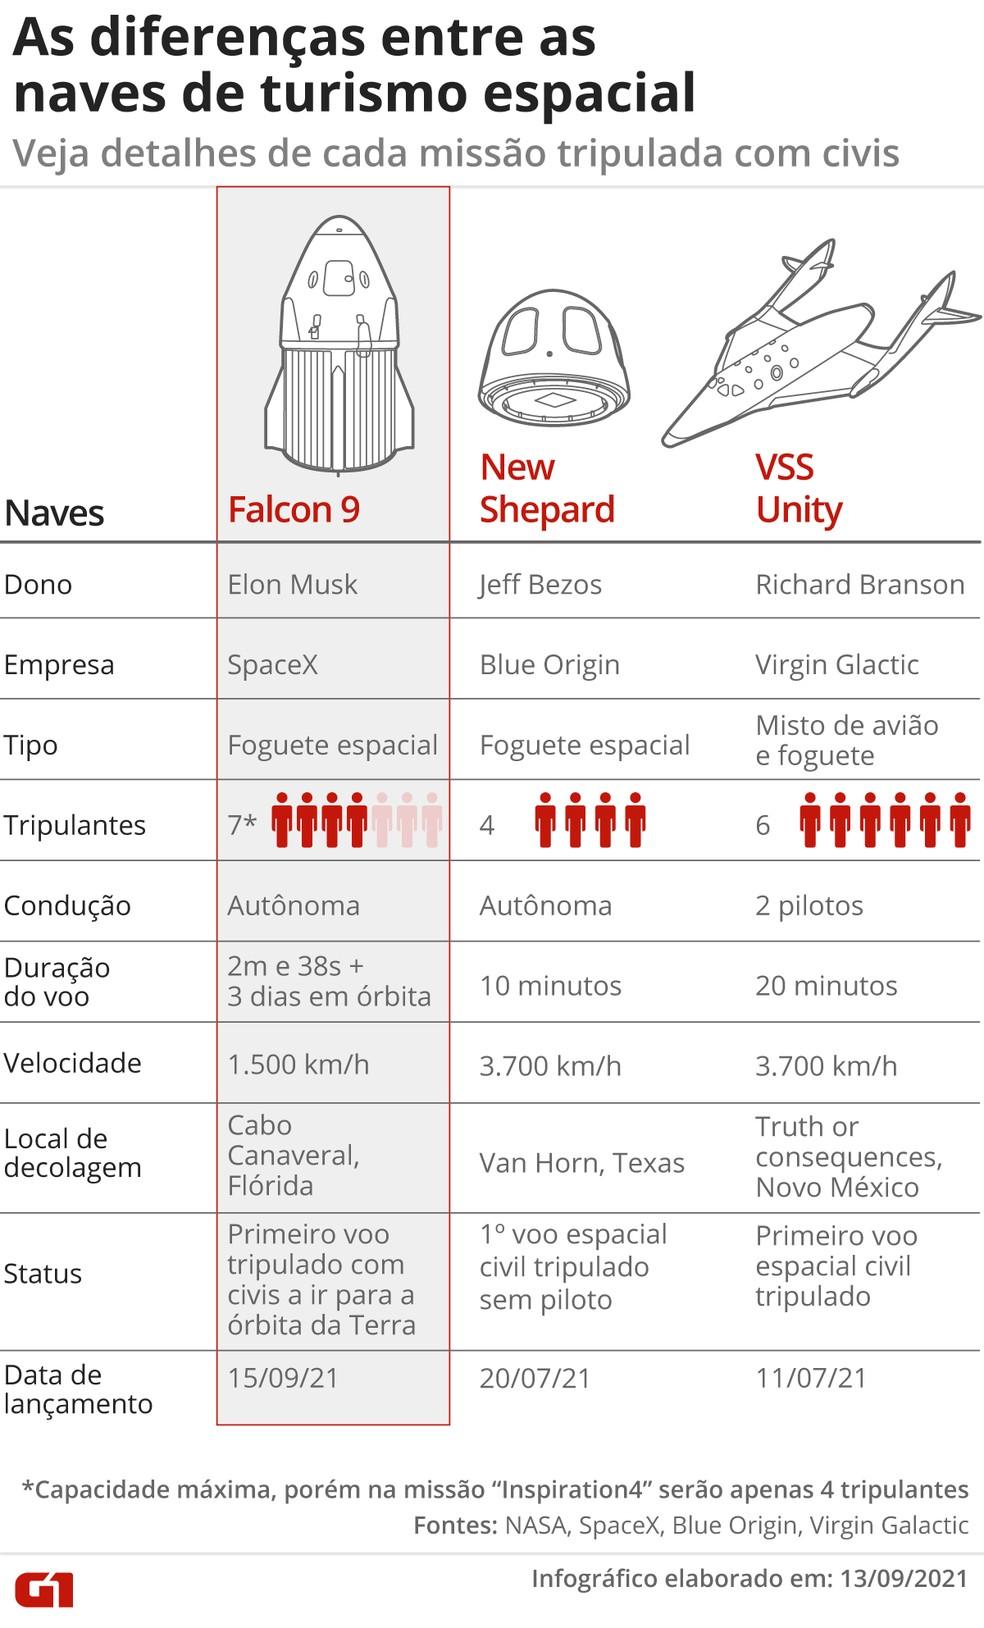 Diferenças entre as aeronaves da SpaceX, Blue Origin e Virgin Galactic — Foto: Kayan Albertin/Arte G1